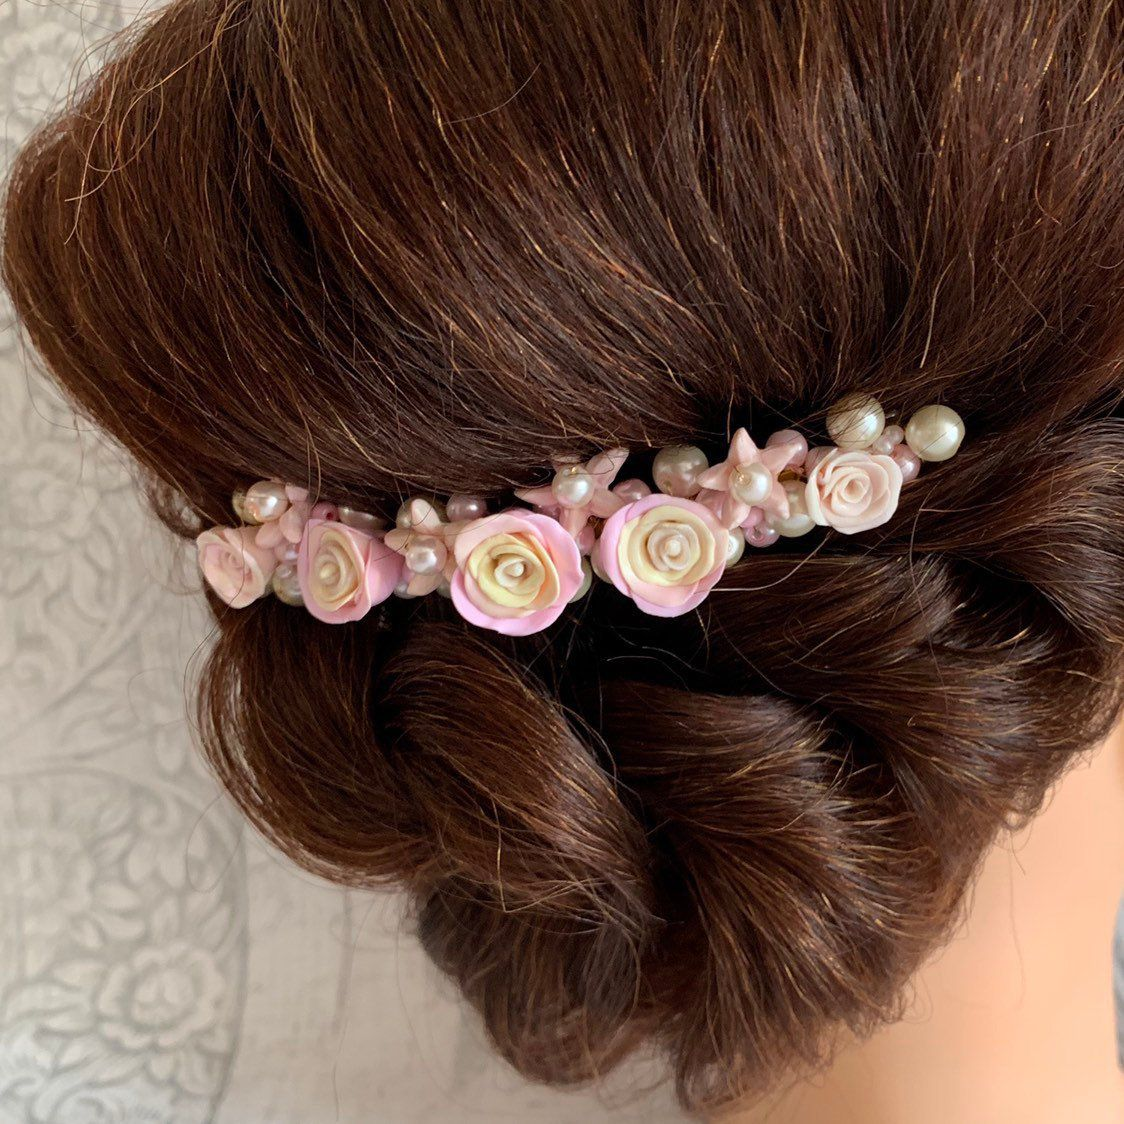 decorative bridal hair accessory, handmade polymer clay pink